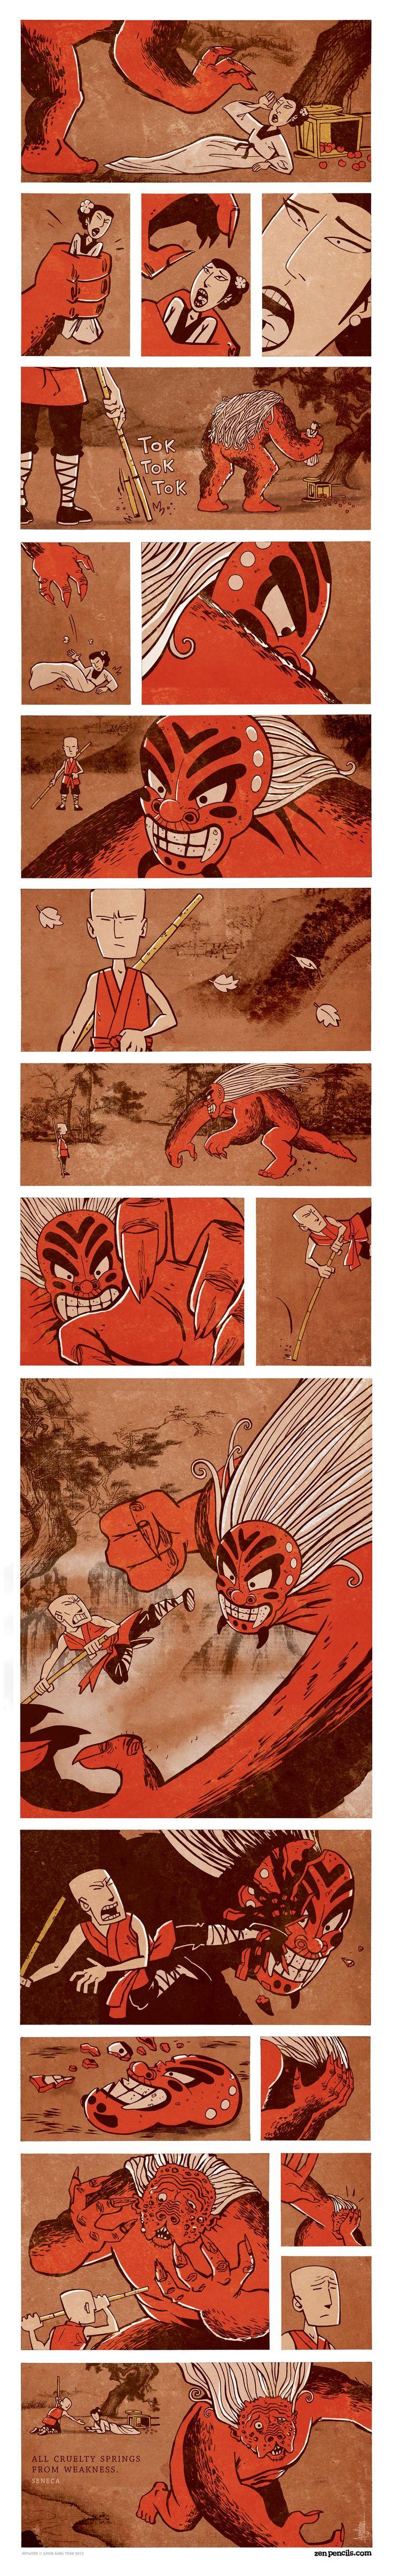 The Curious Brain » SENECA: Sympathy for the Devil